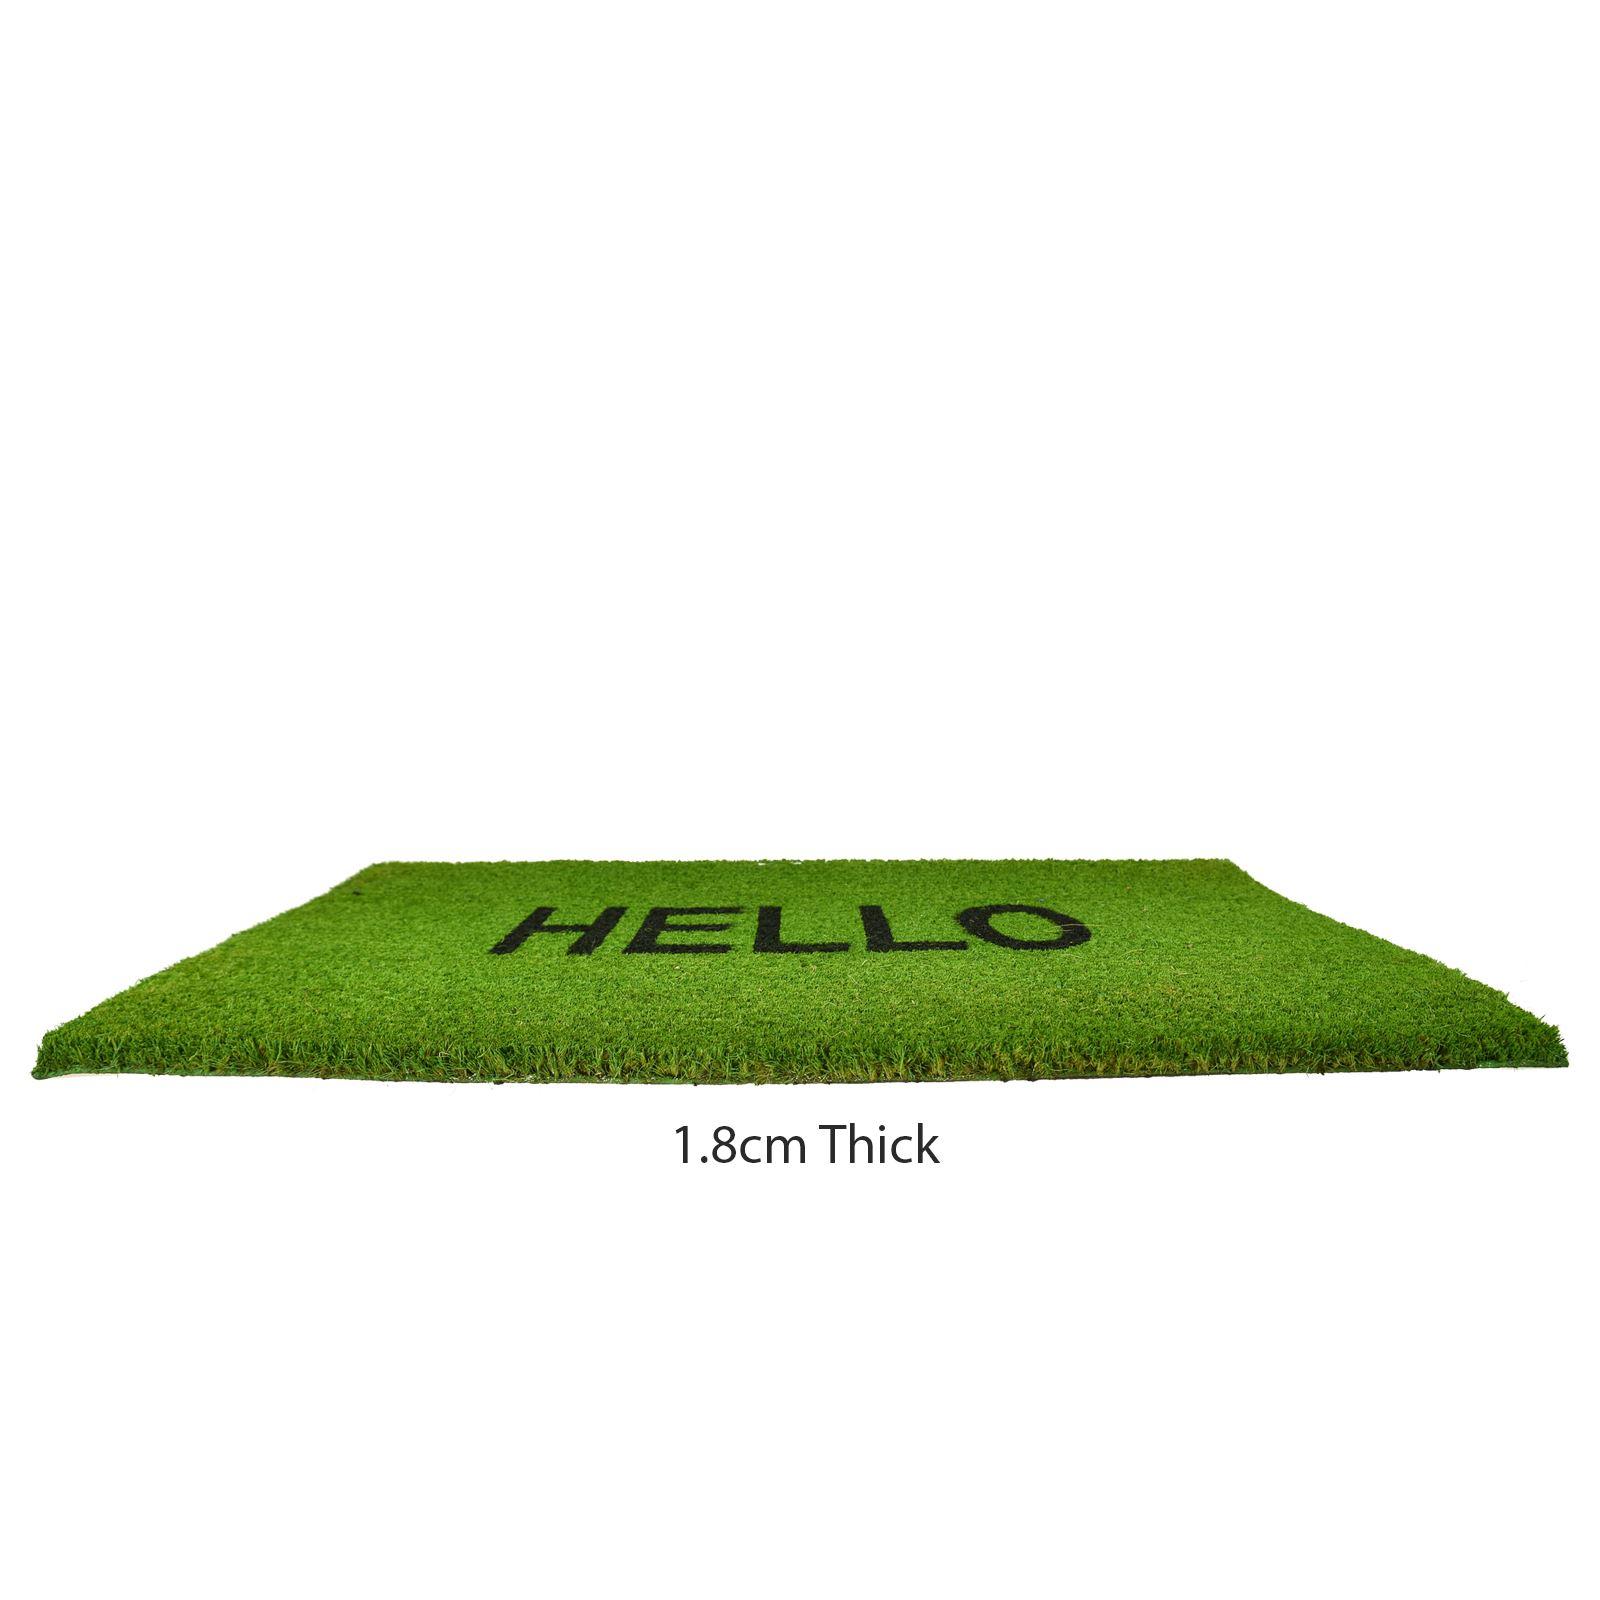 Plain-Non-Slip-Door-Mat-Tough-Natural-Coir-PVC-Back-Welcome-Doormat-40-x-60cm miniatura 67